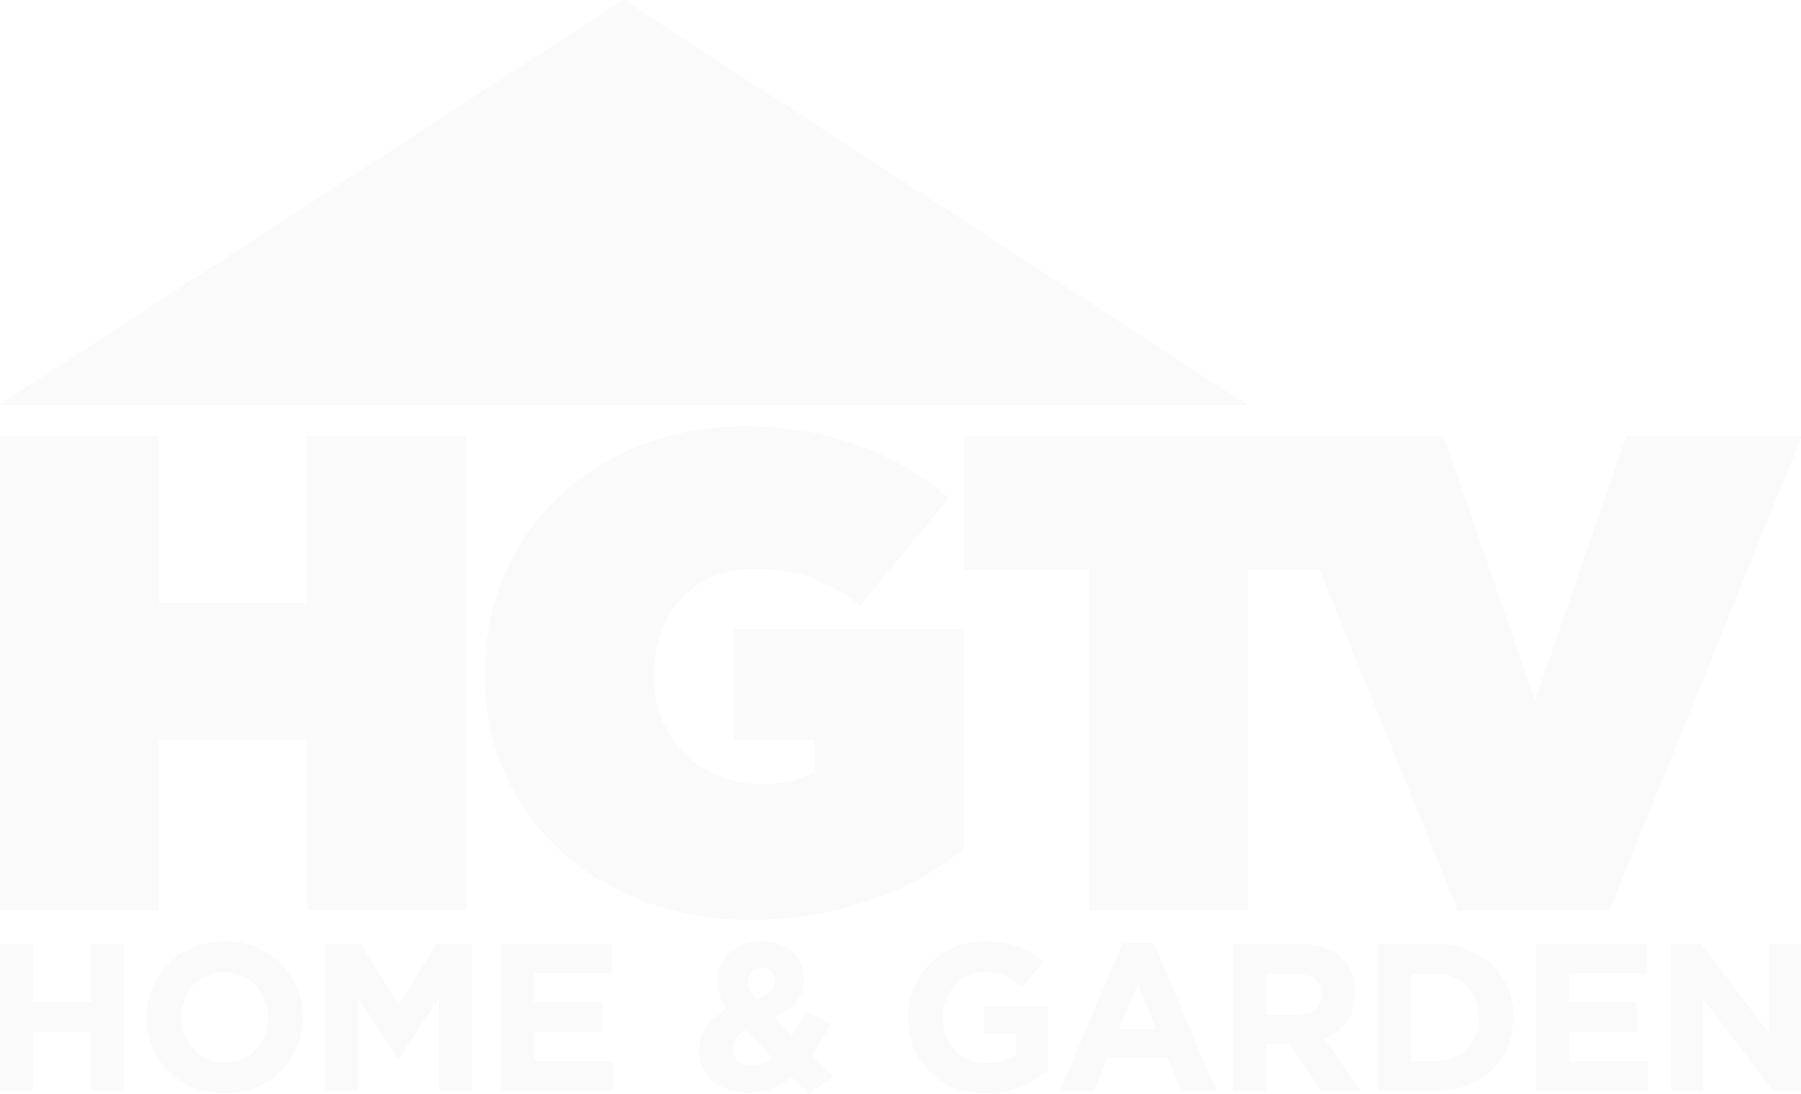 HGTV_Descriptor_Logo_Bone_China_RGB